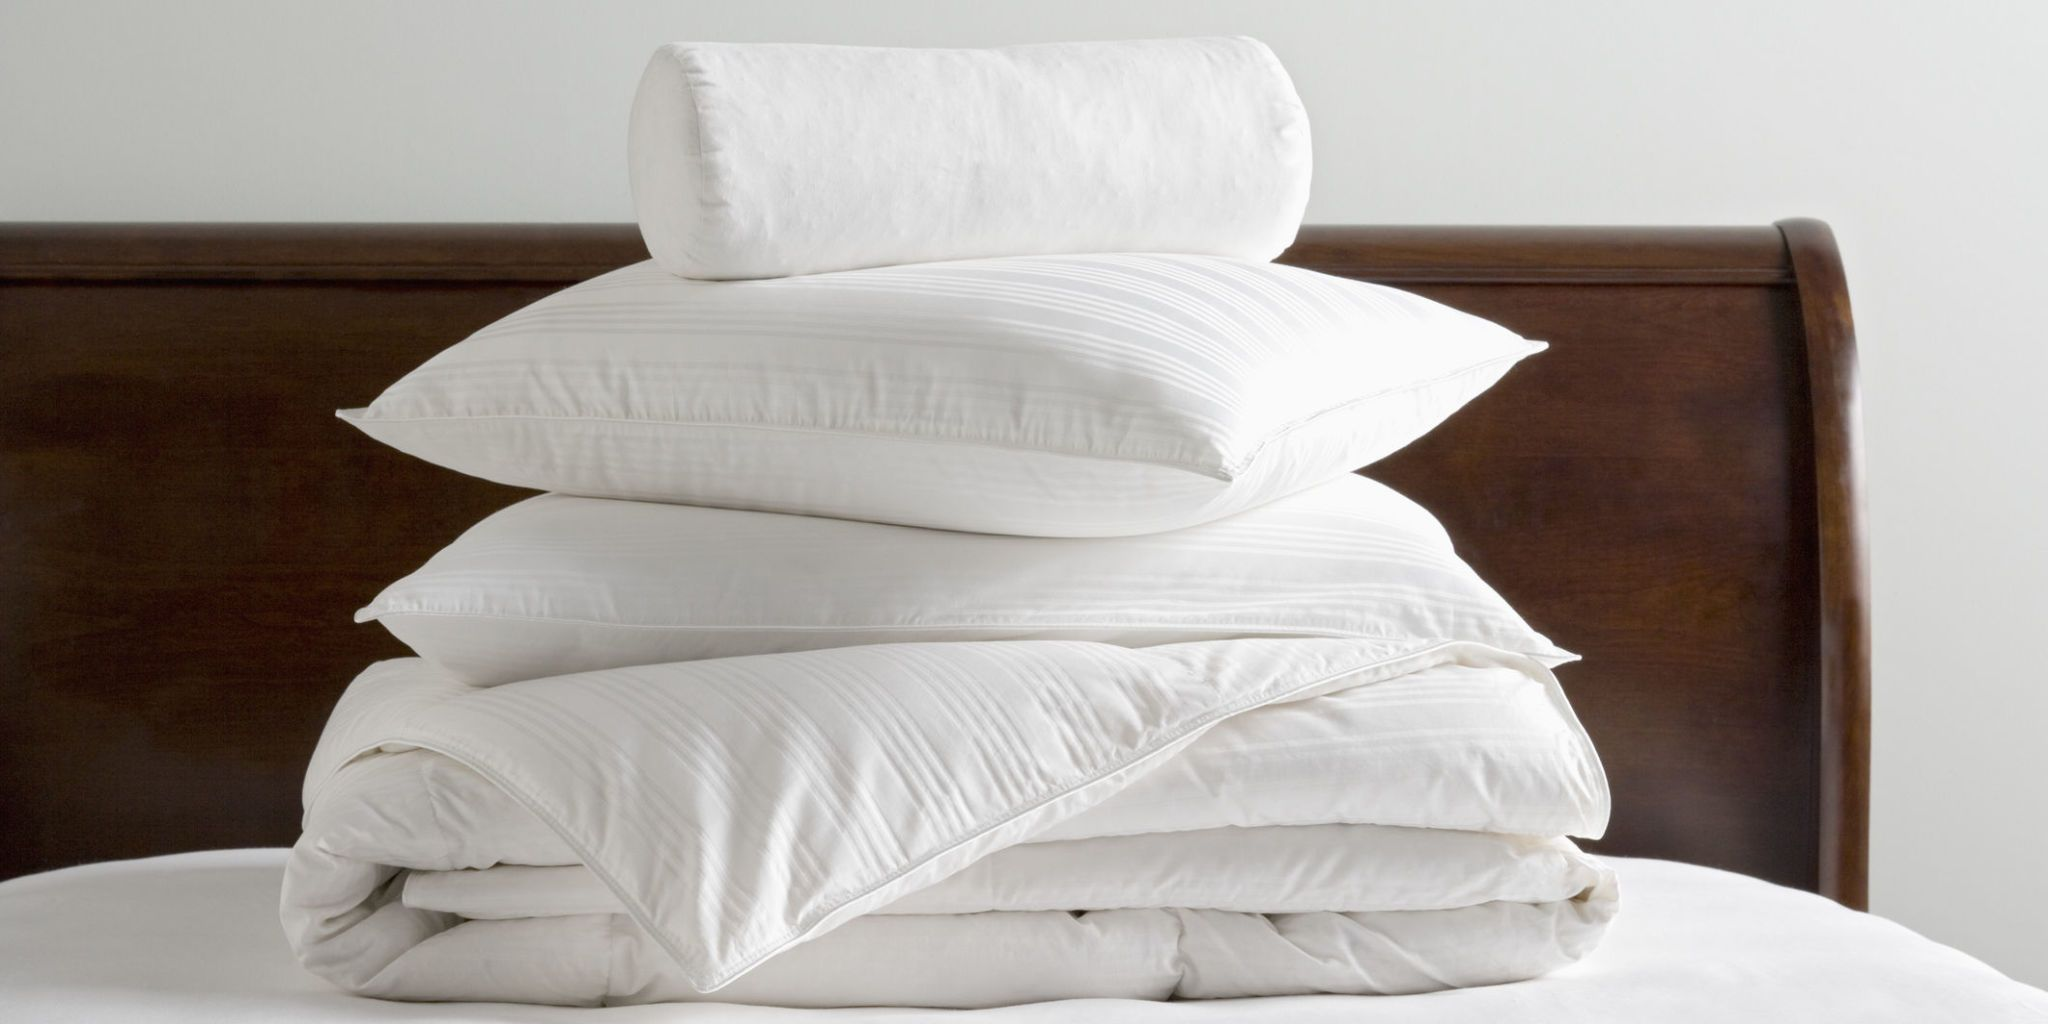 Pillow Reviews & 20 Best Pillow Reviews - Top Rated Bed Pillows